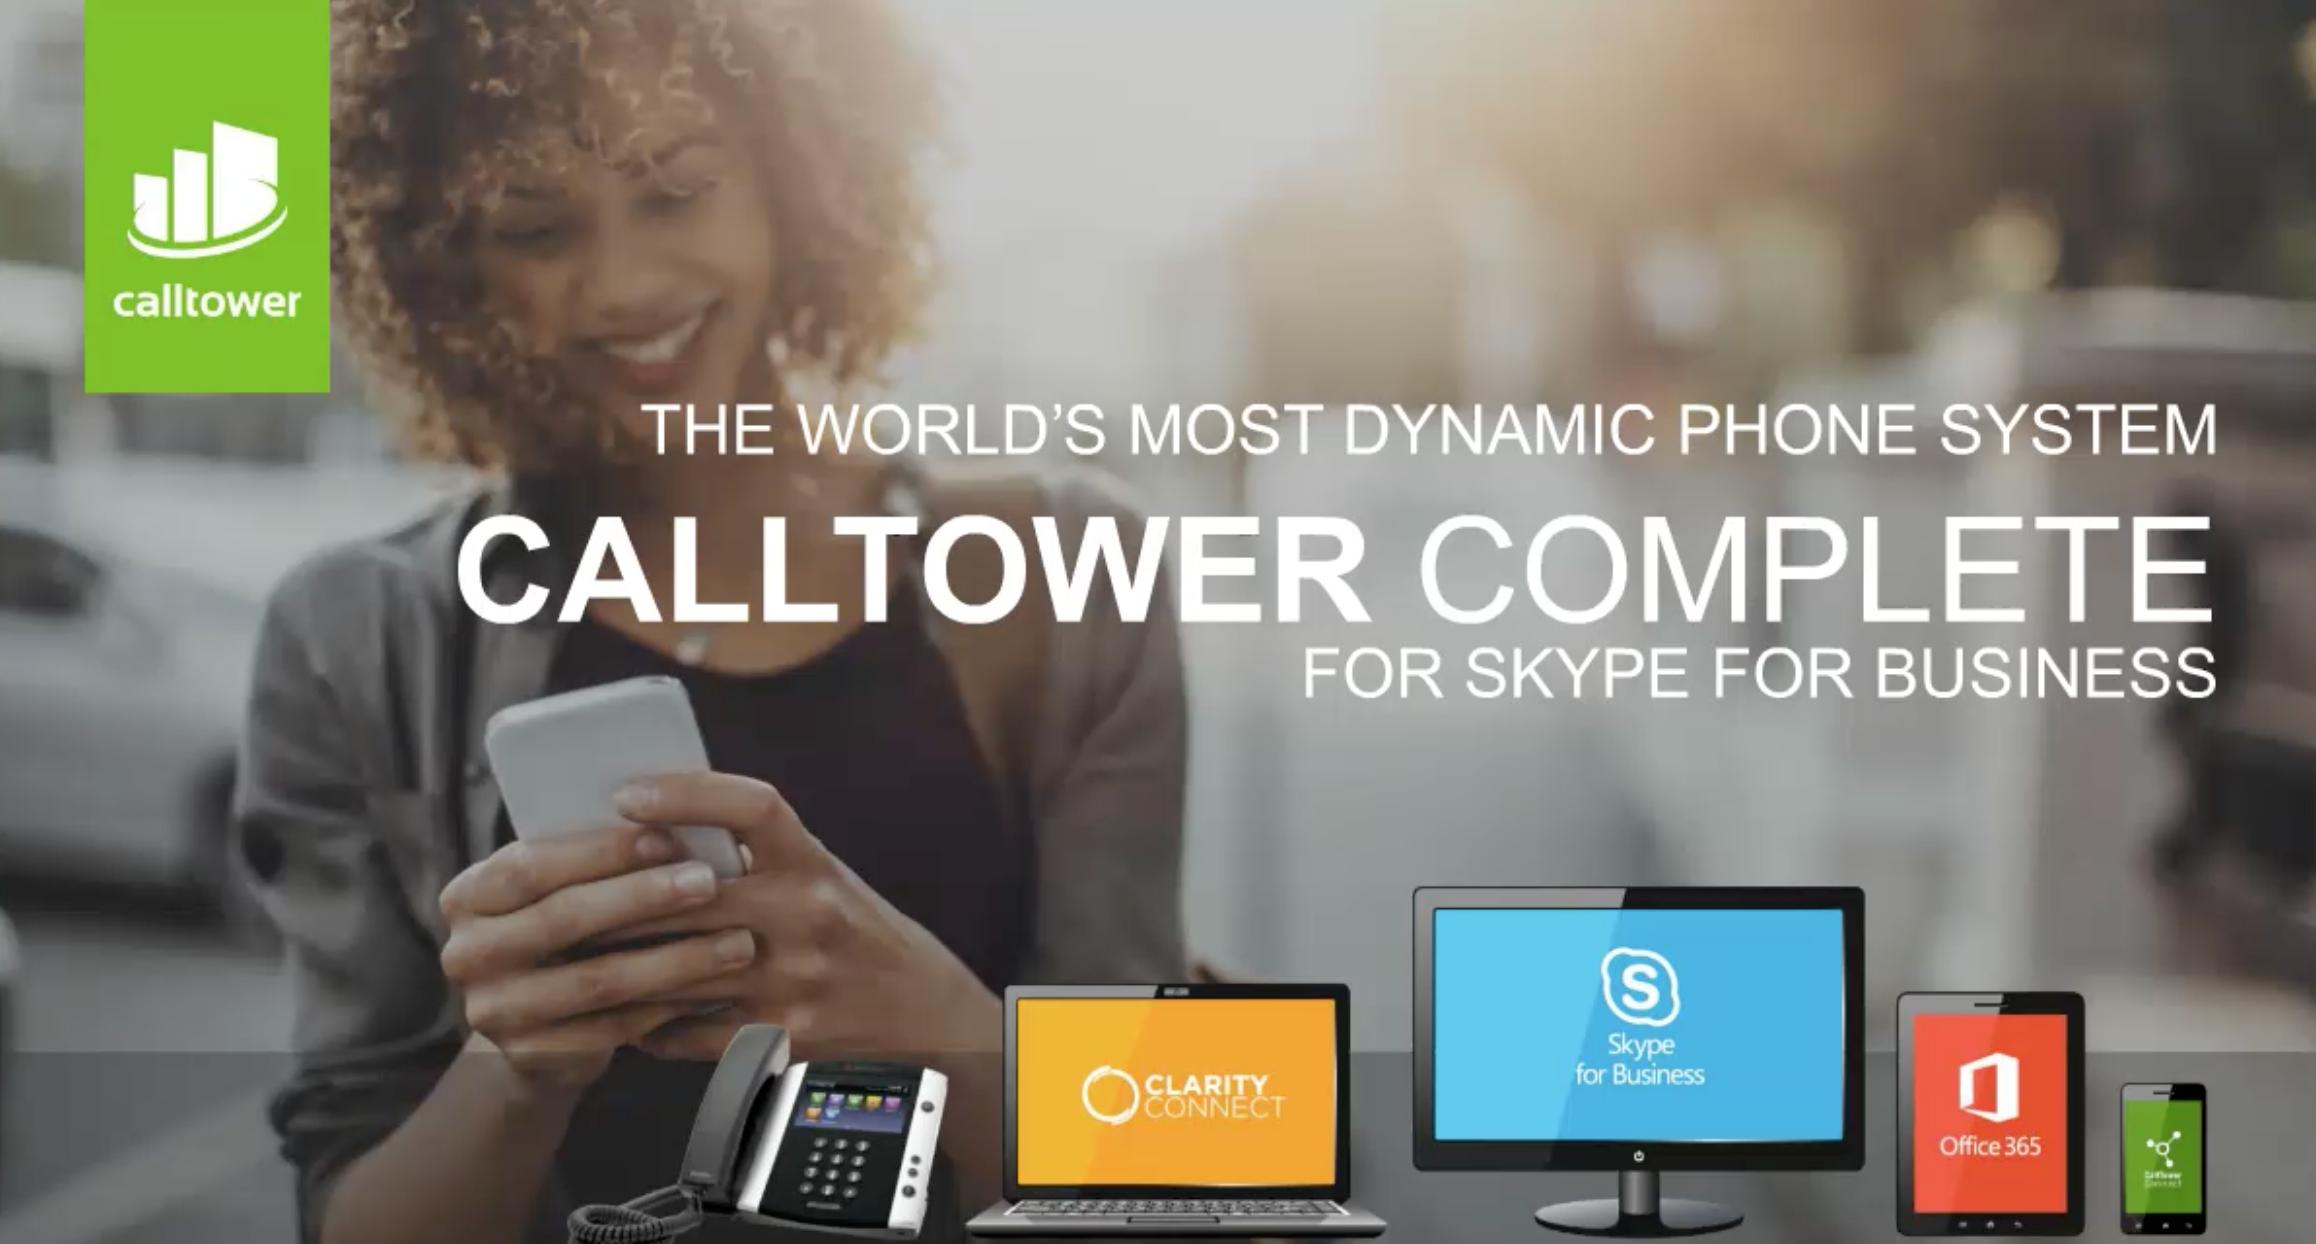 Webinar_CallTower_Complete_for_Skype_for_Business.png